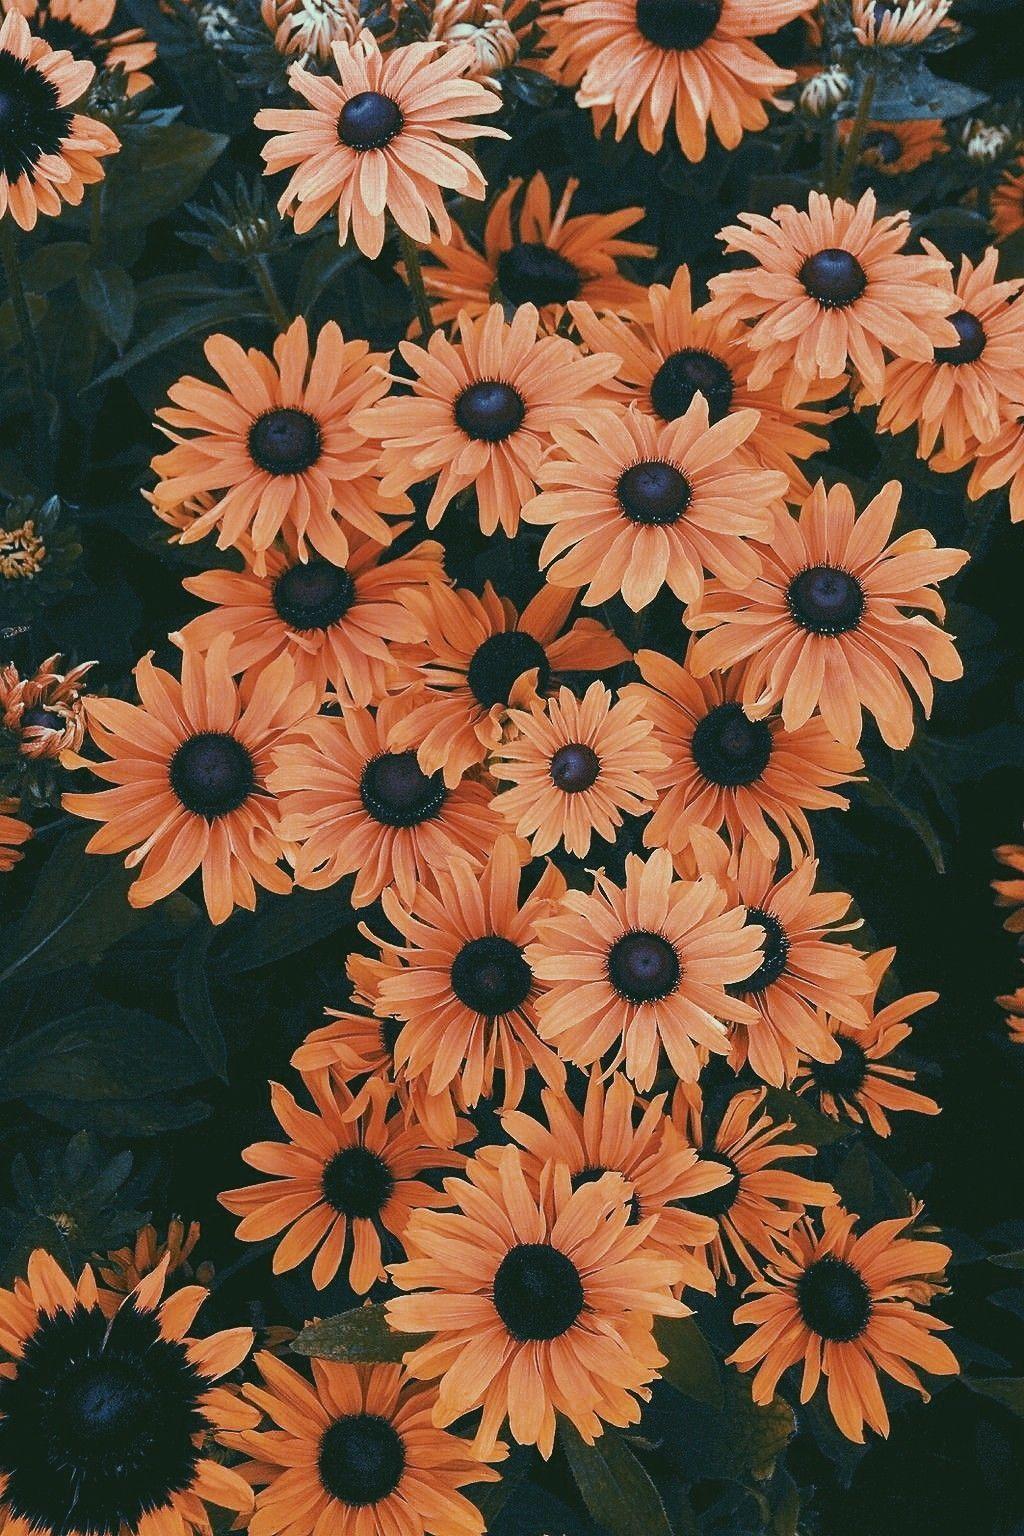 45 Beautiful flower iphone wallpaper ideas , Beautiful flowers iphone, wallpaper iphone wallpaper, iphone xs, iphone 7s, iphone 8s #wallpaper #falliphonewallpaper